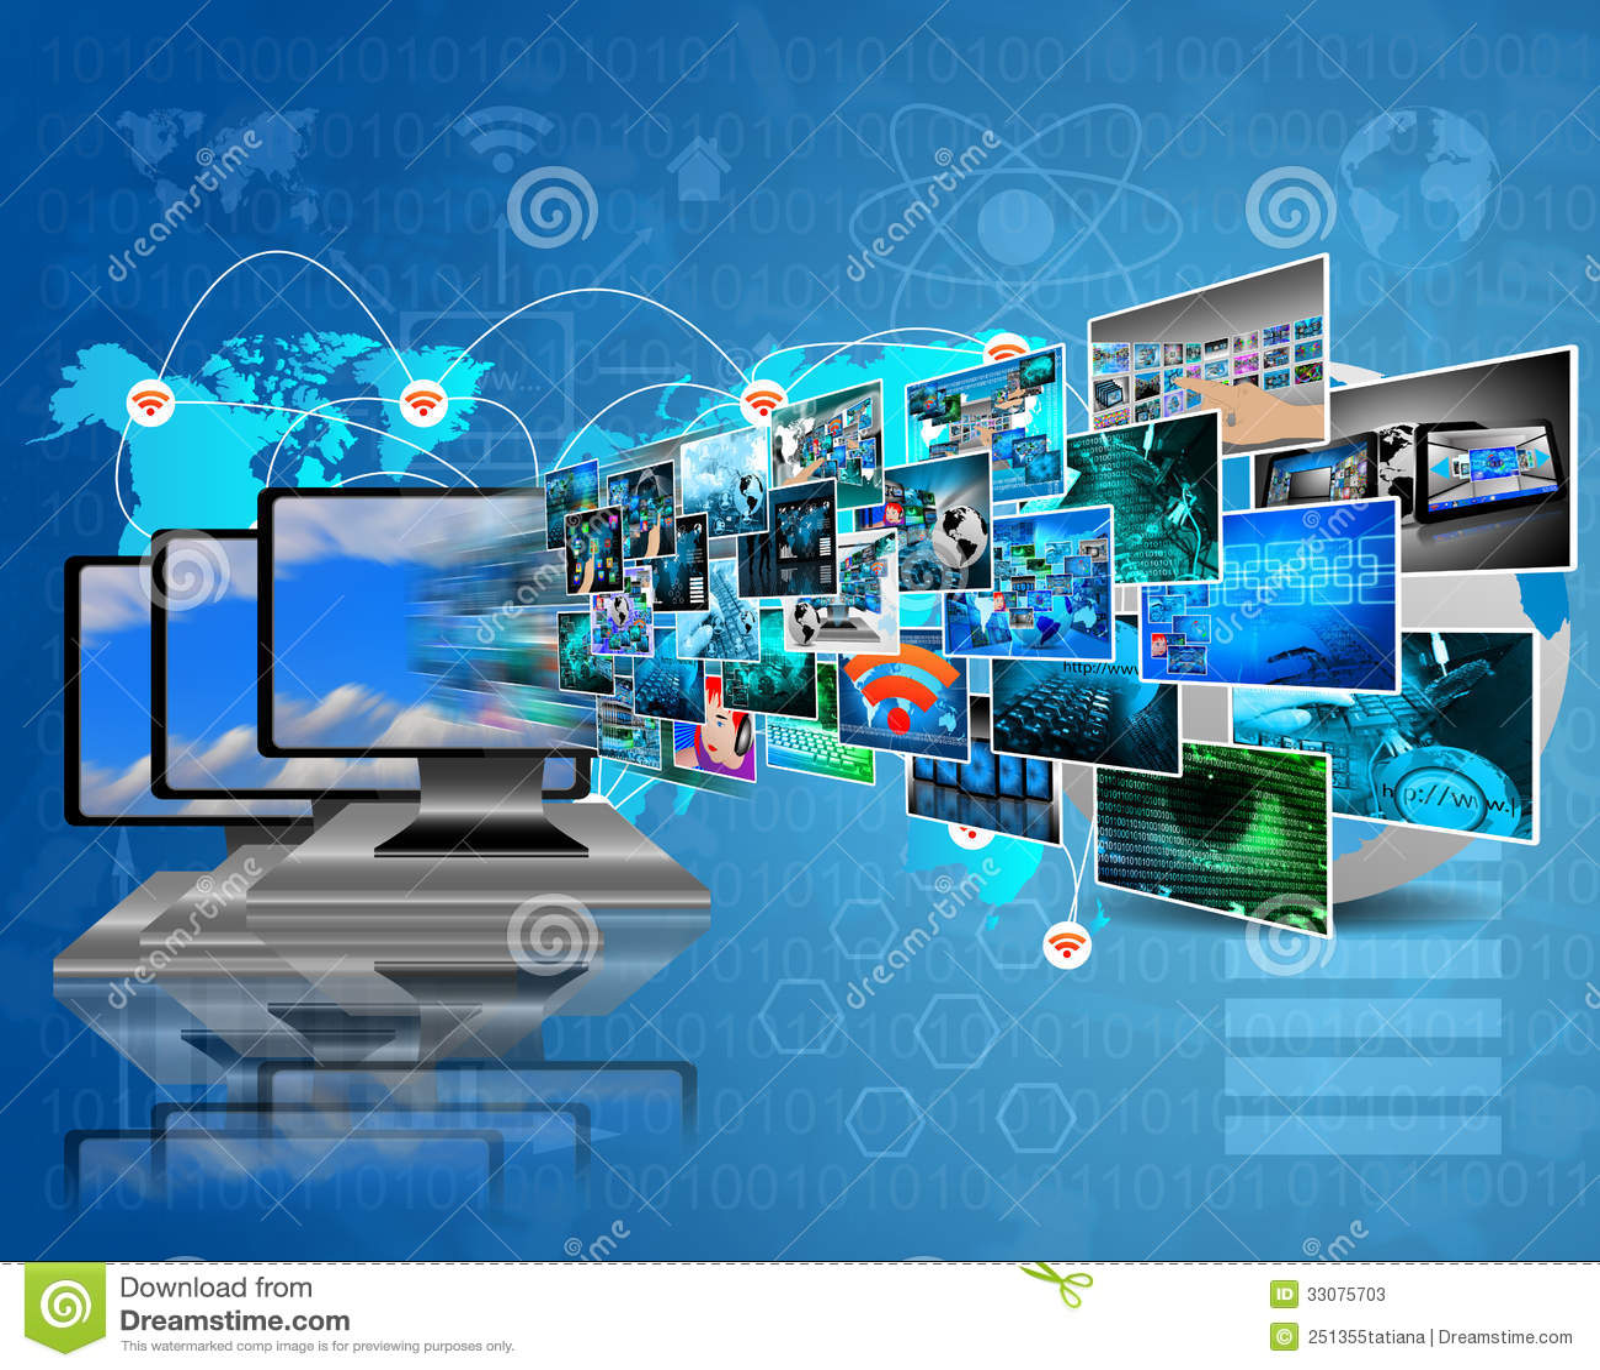 Computers Technology: Data Transfer Stock Photos